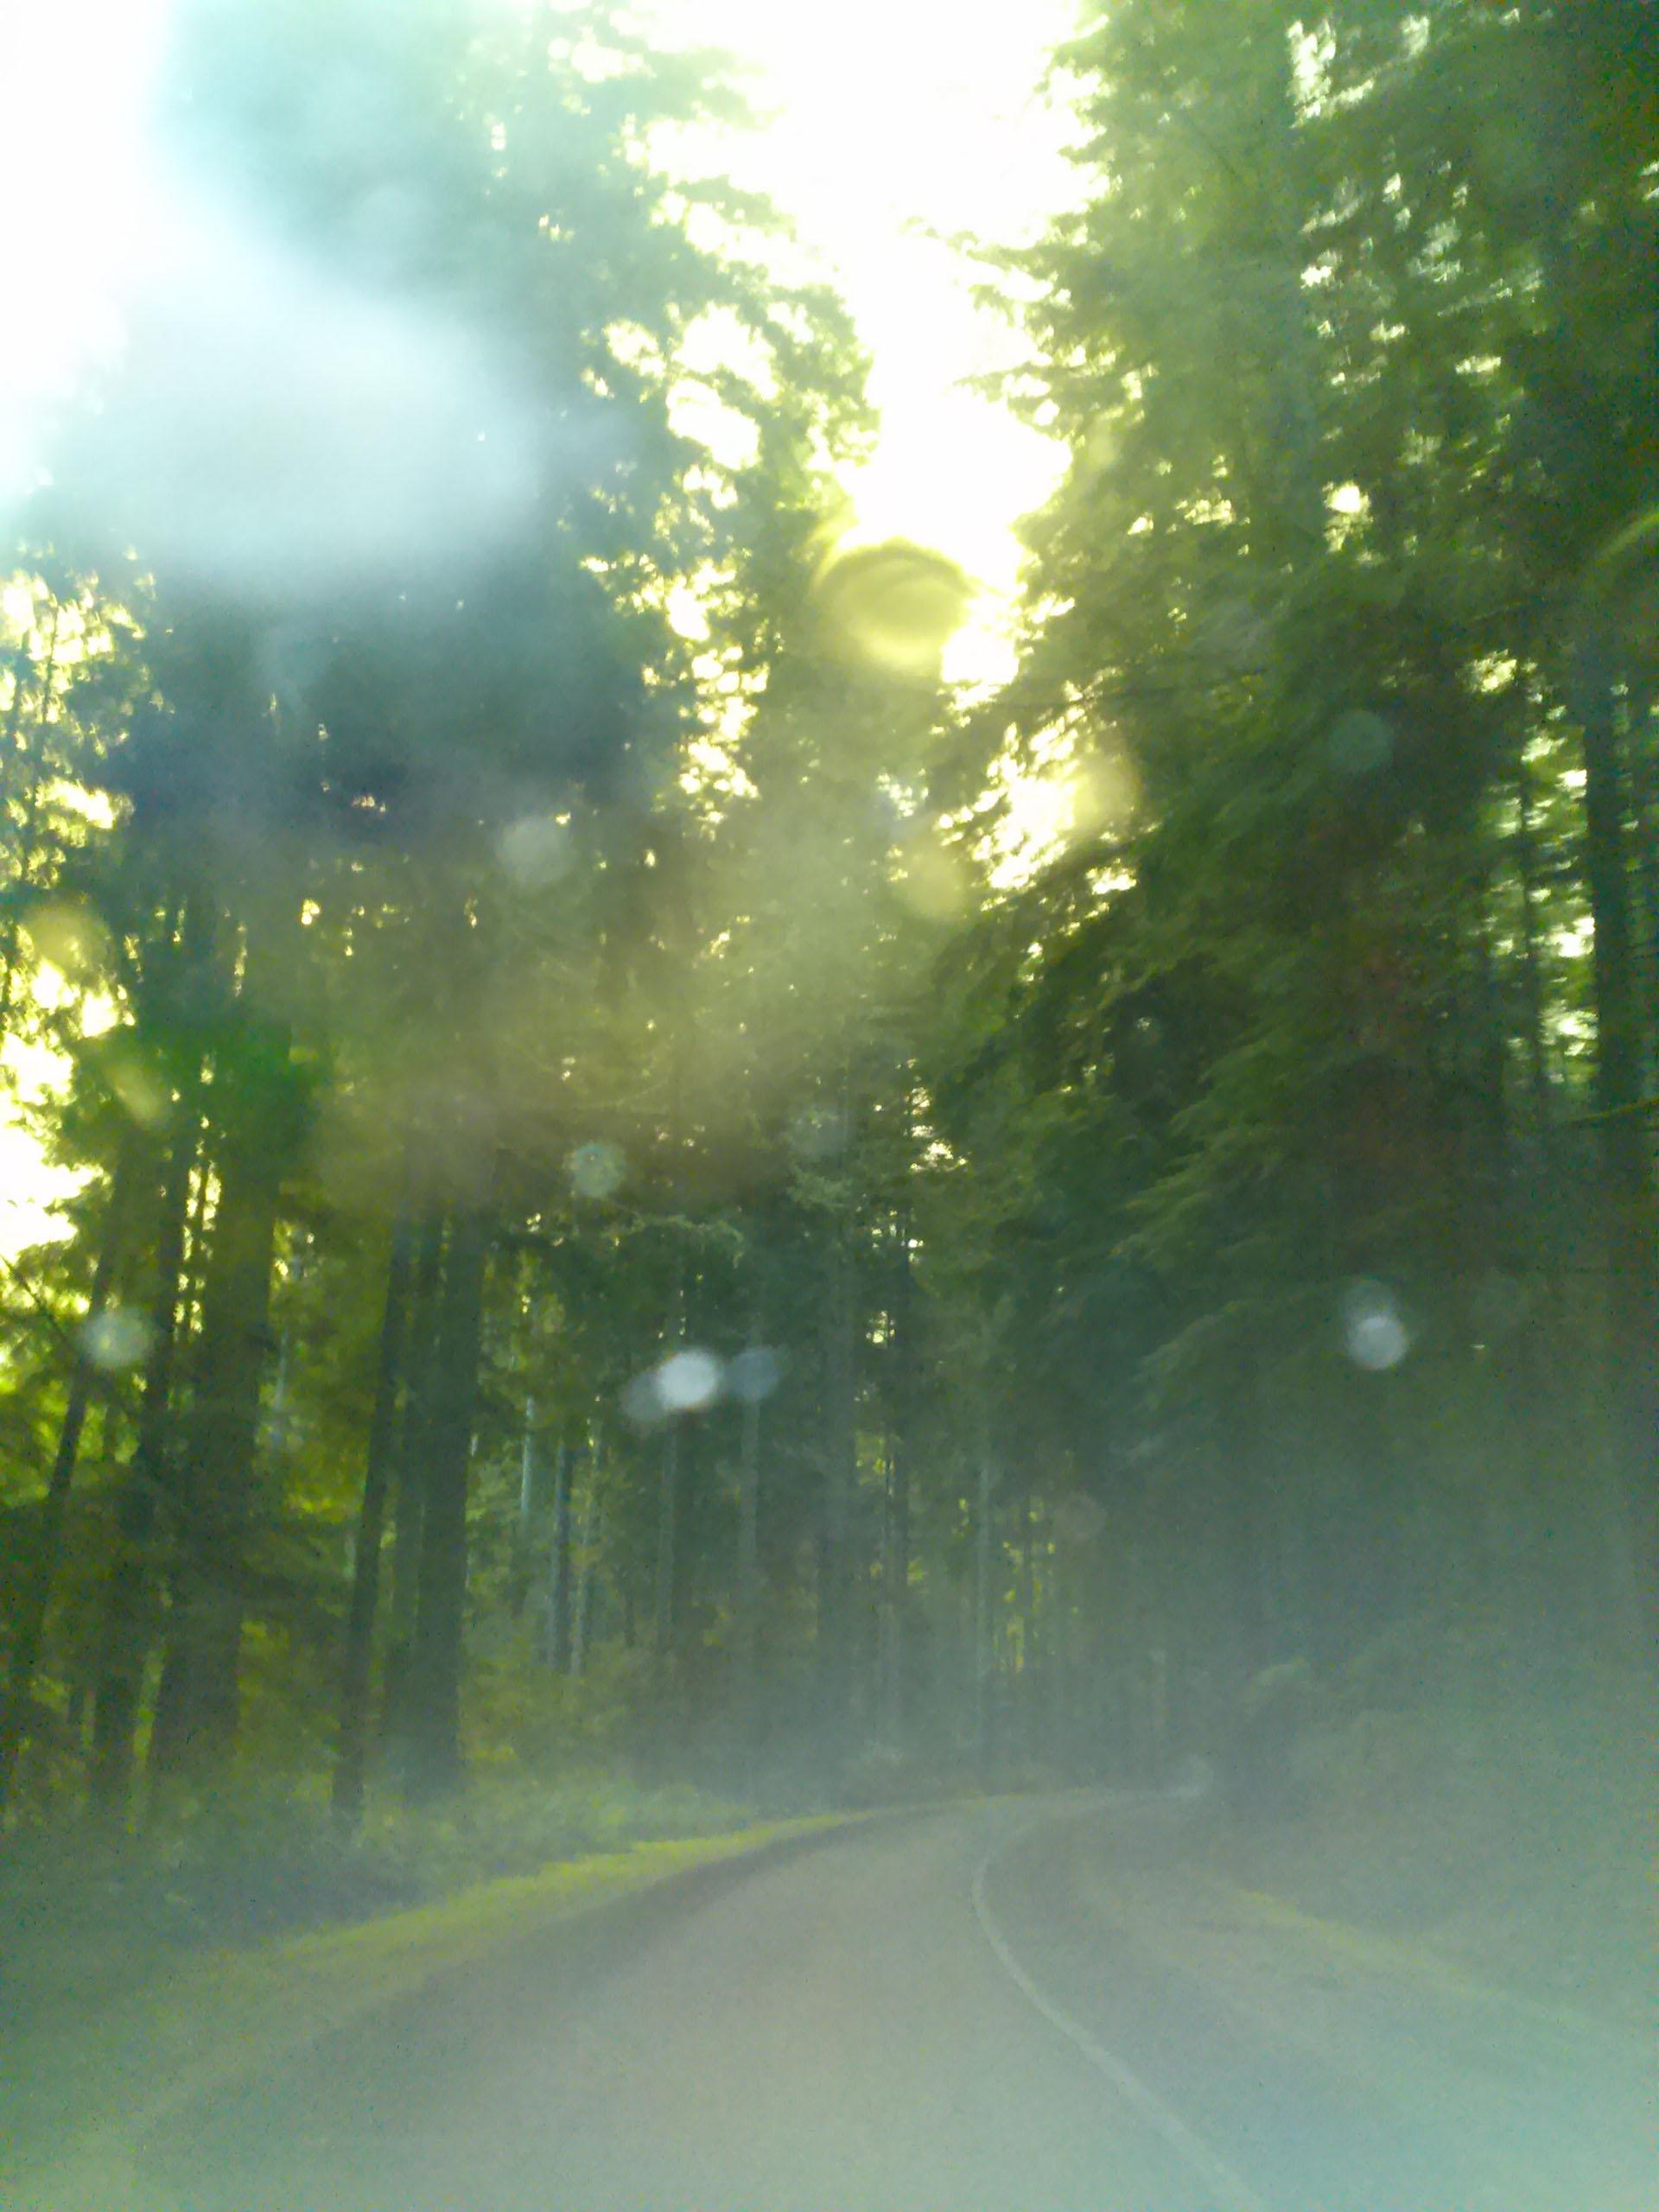 Blurry Road - Final